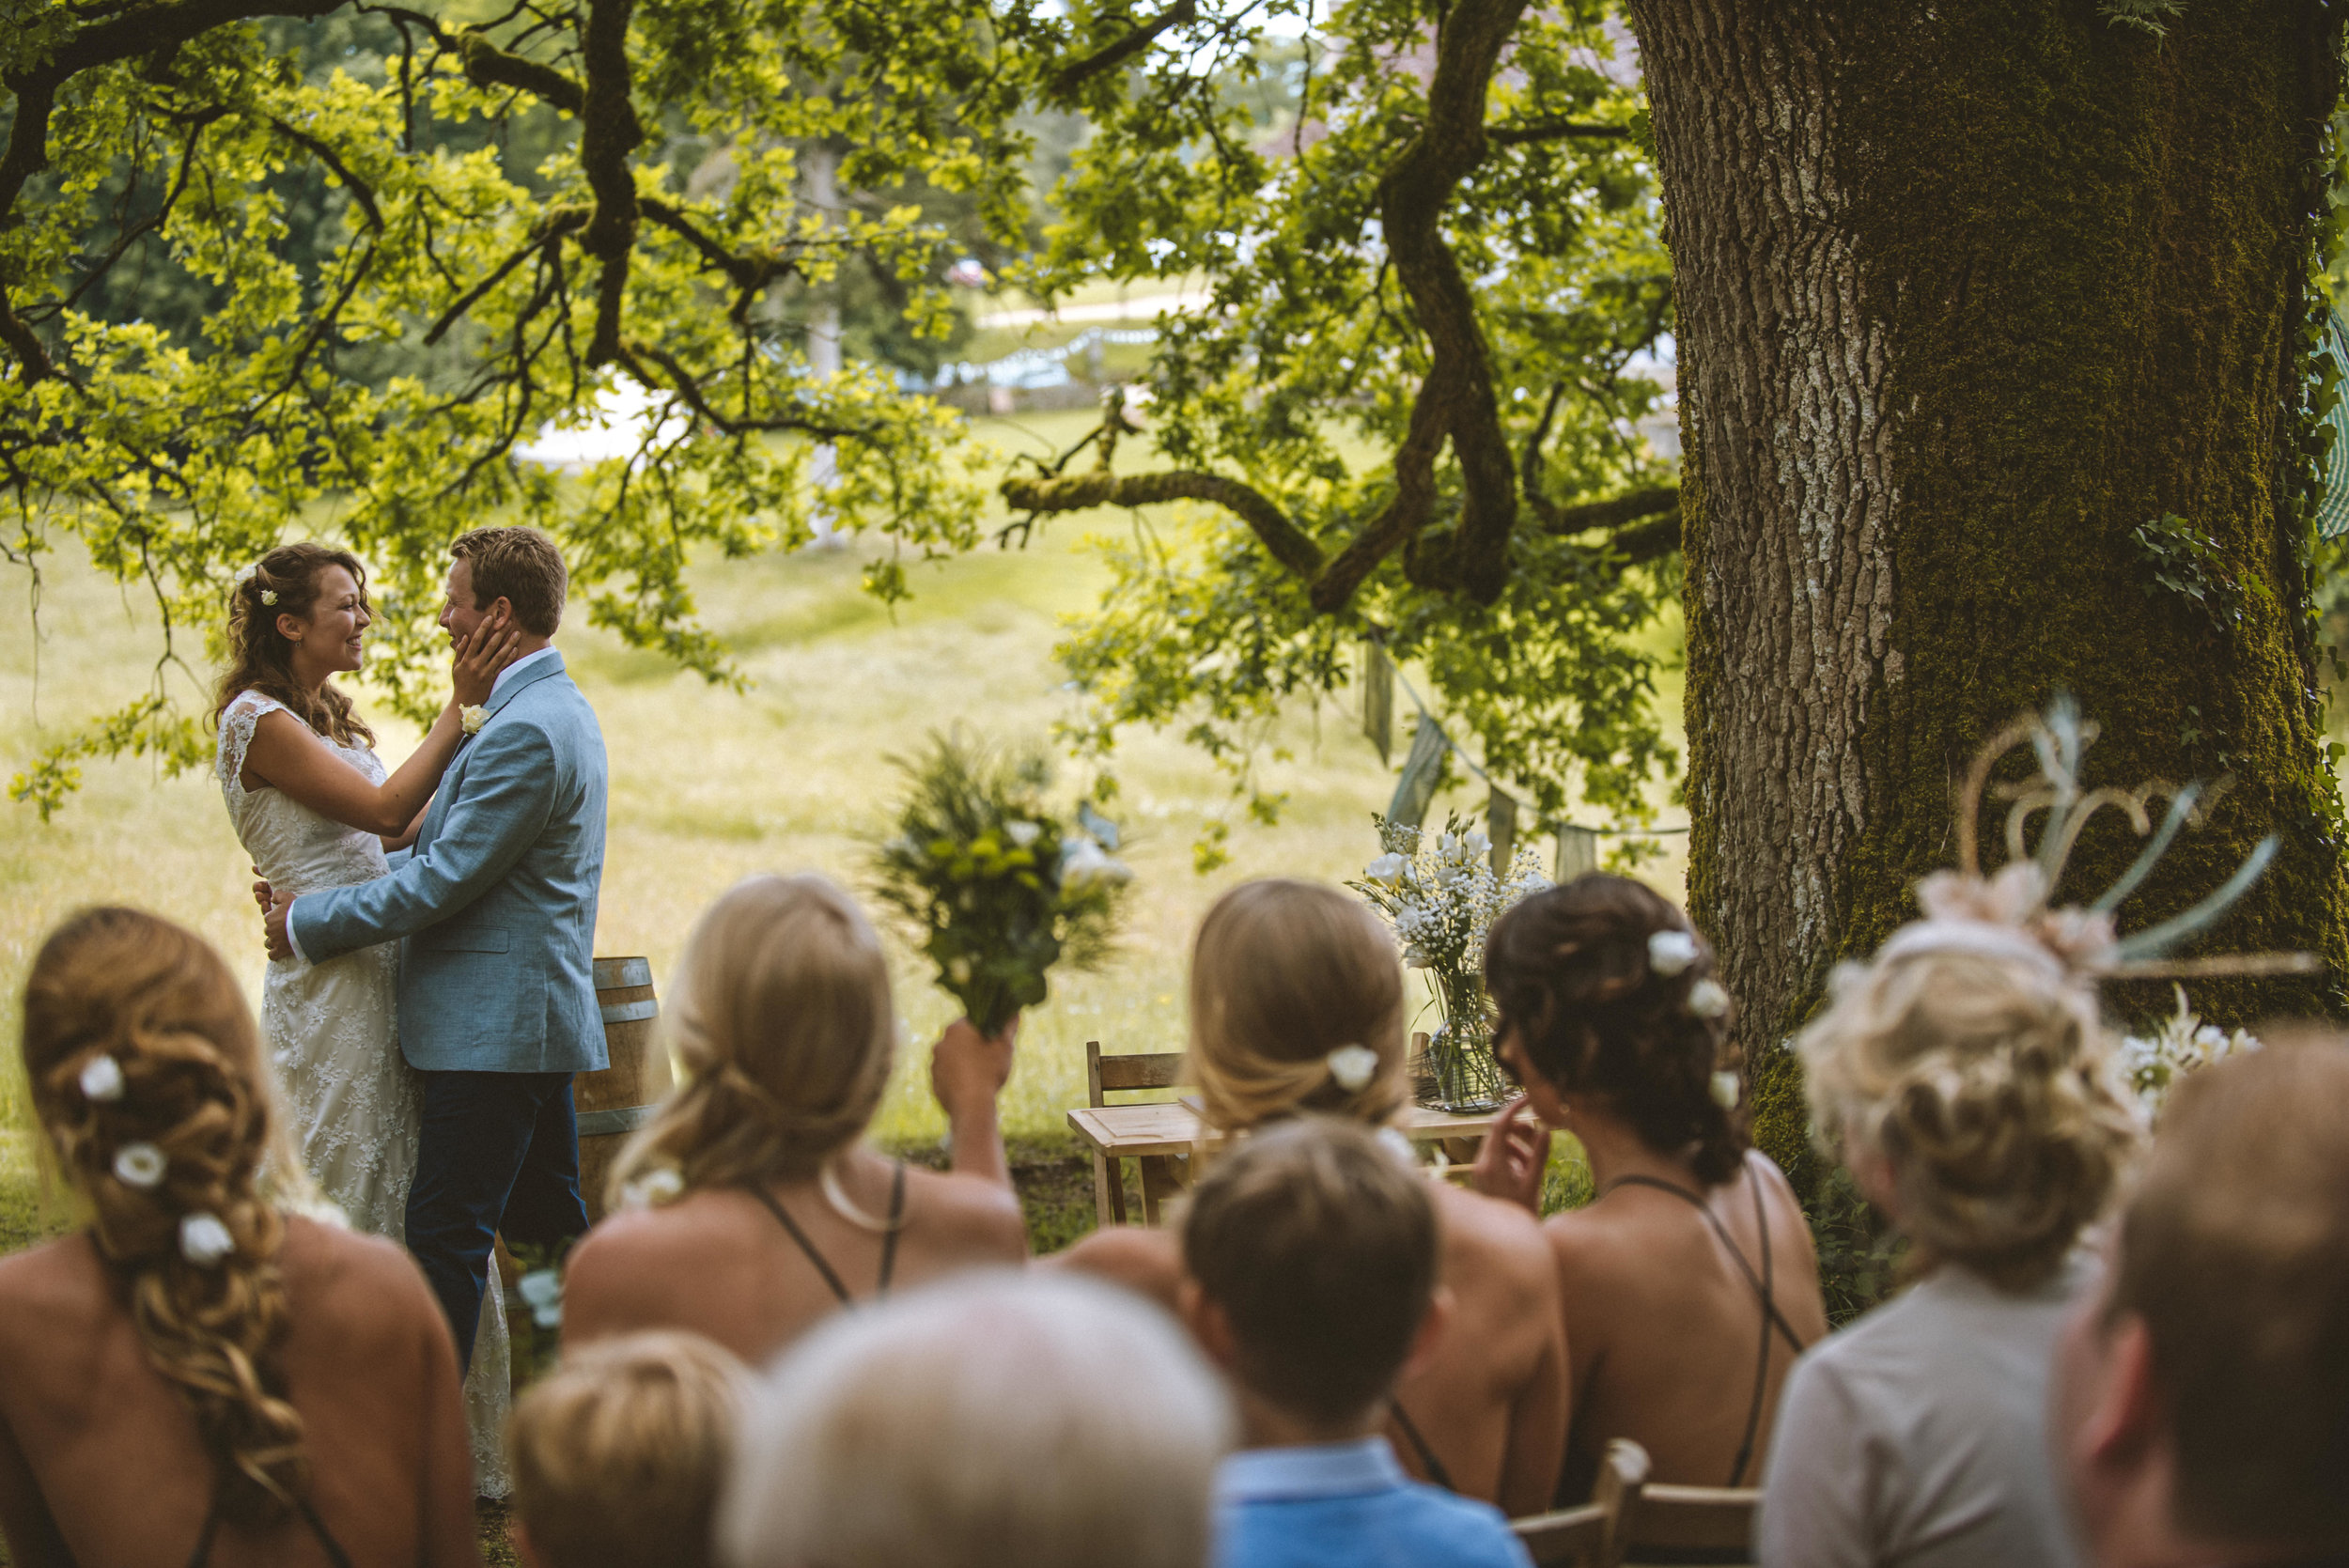 dordogne-wedding-photographer-mark-shaw-33.jpg